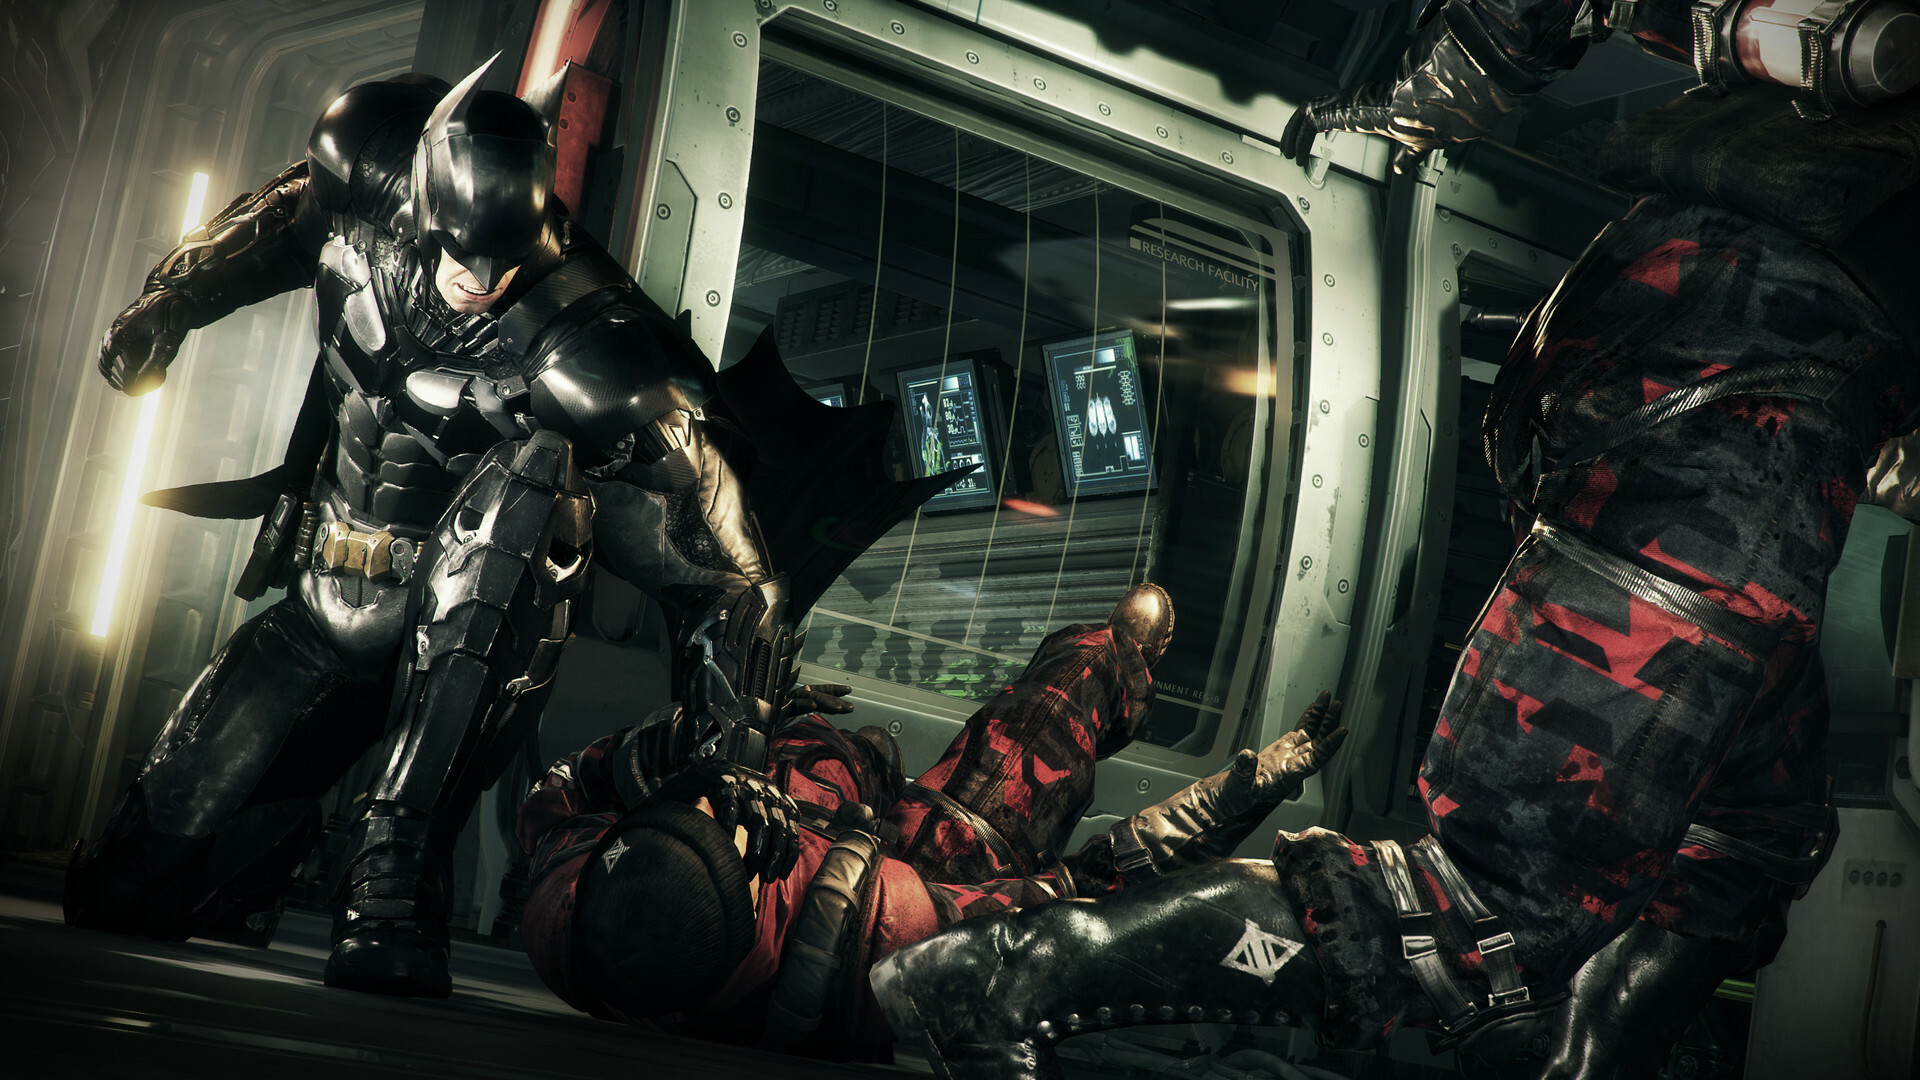 batman-arkham-knight-premium-edition-pc-screenshot-04